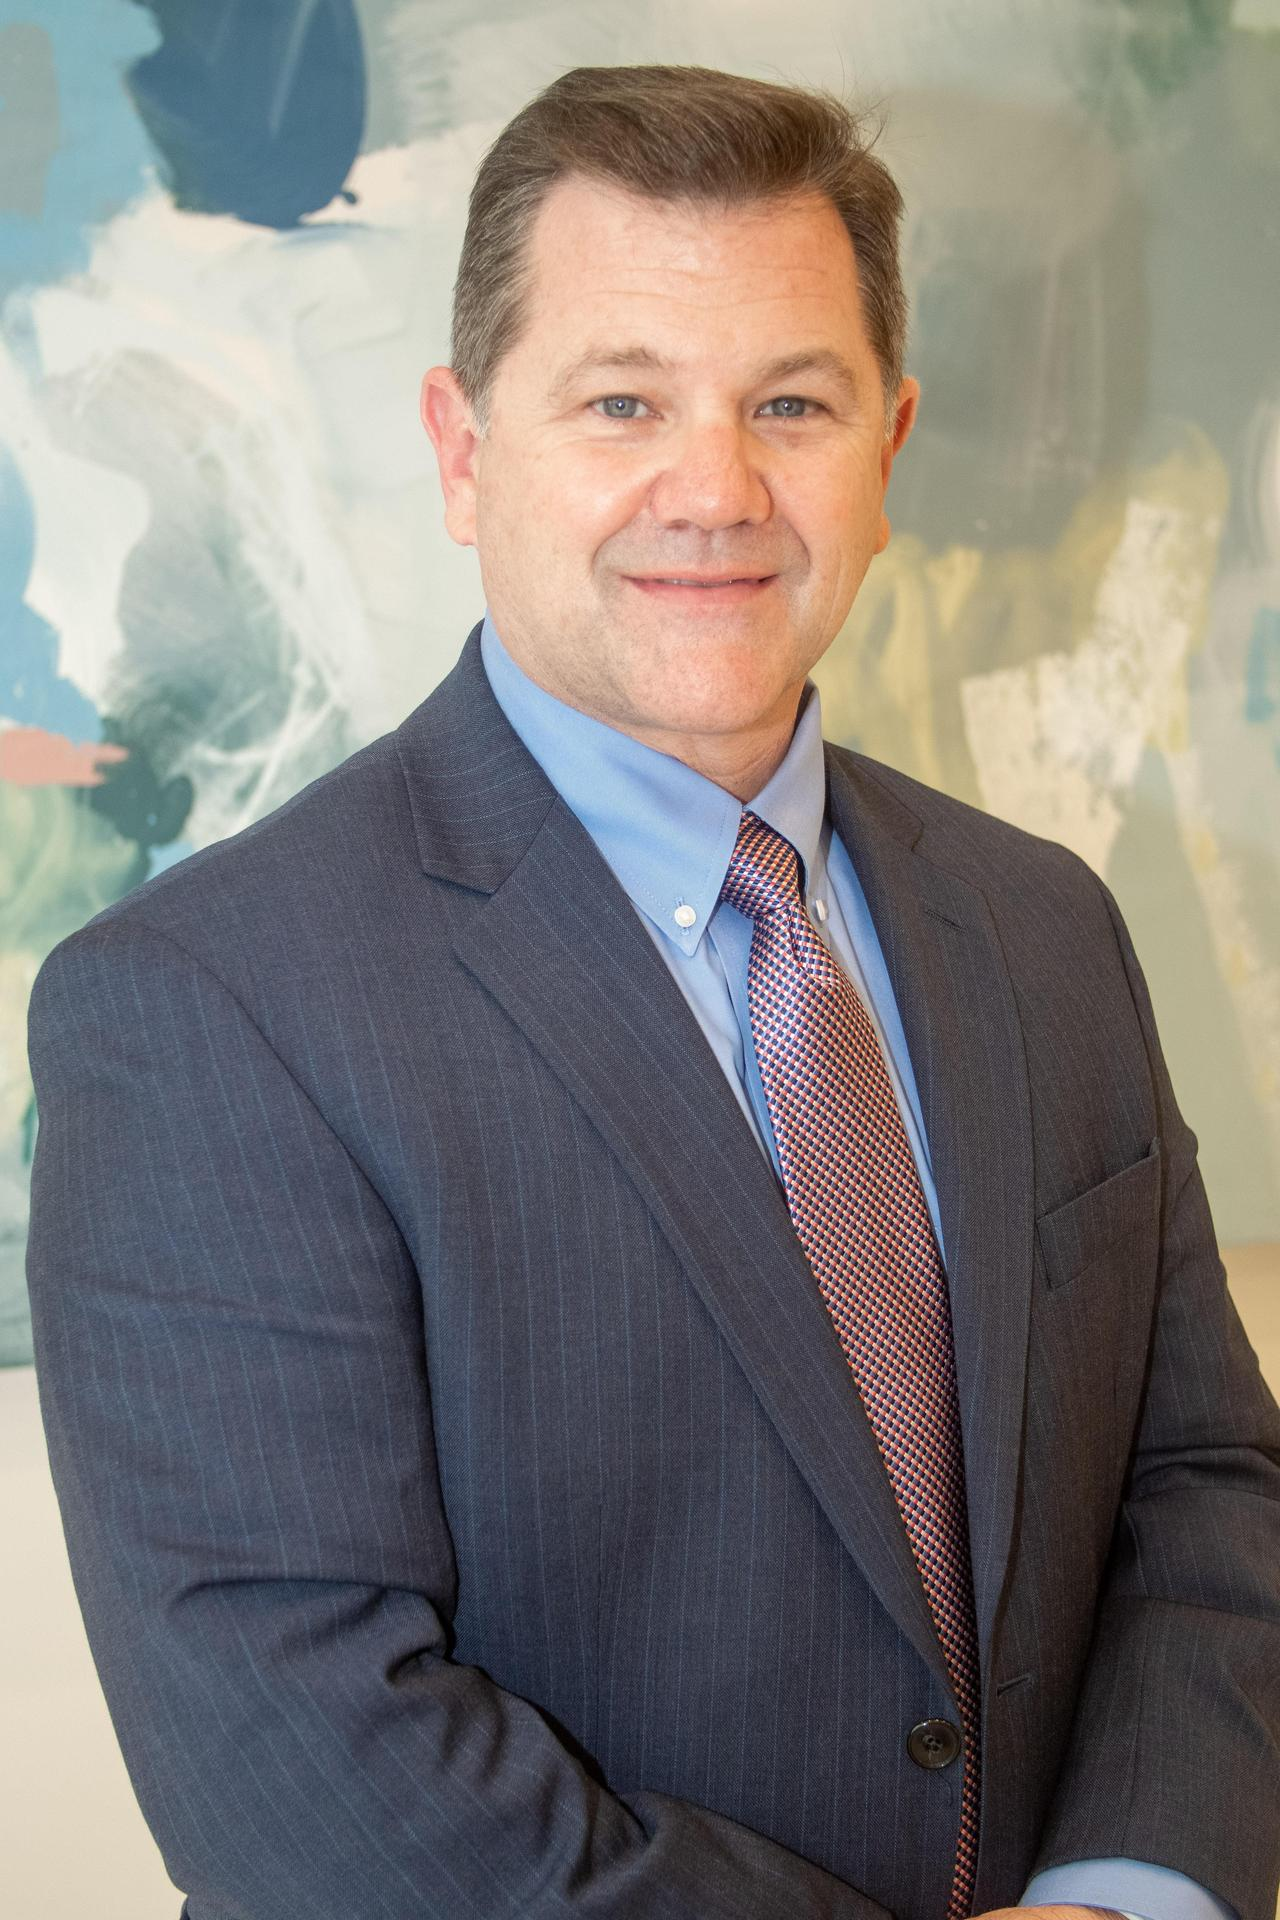 Trustee Doug Woodward